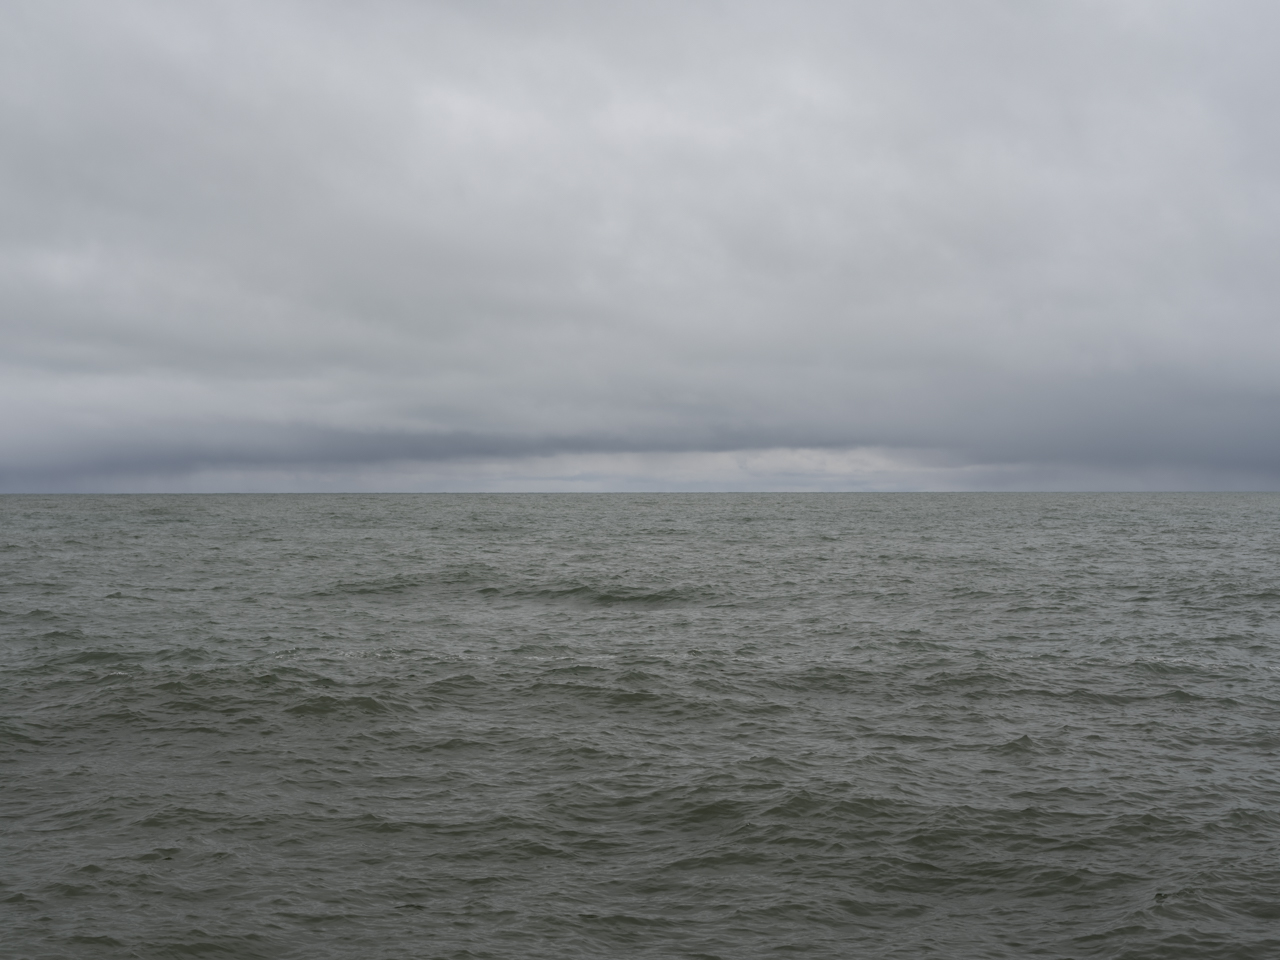 gray green lake and heavier clouds on Lake Michigan